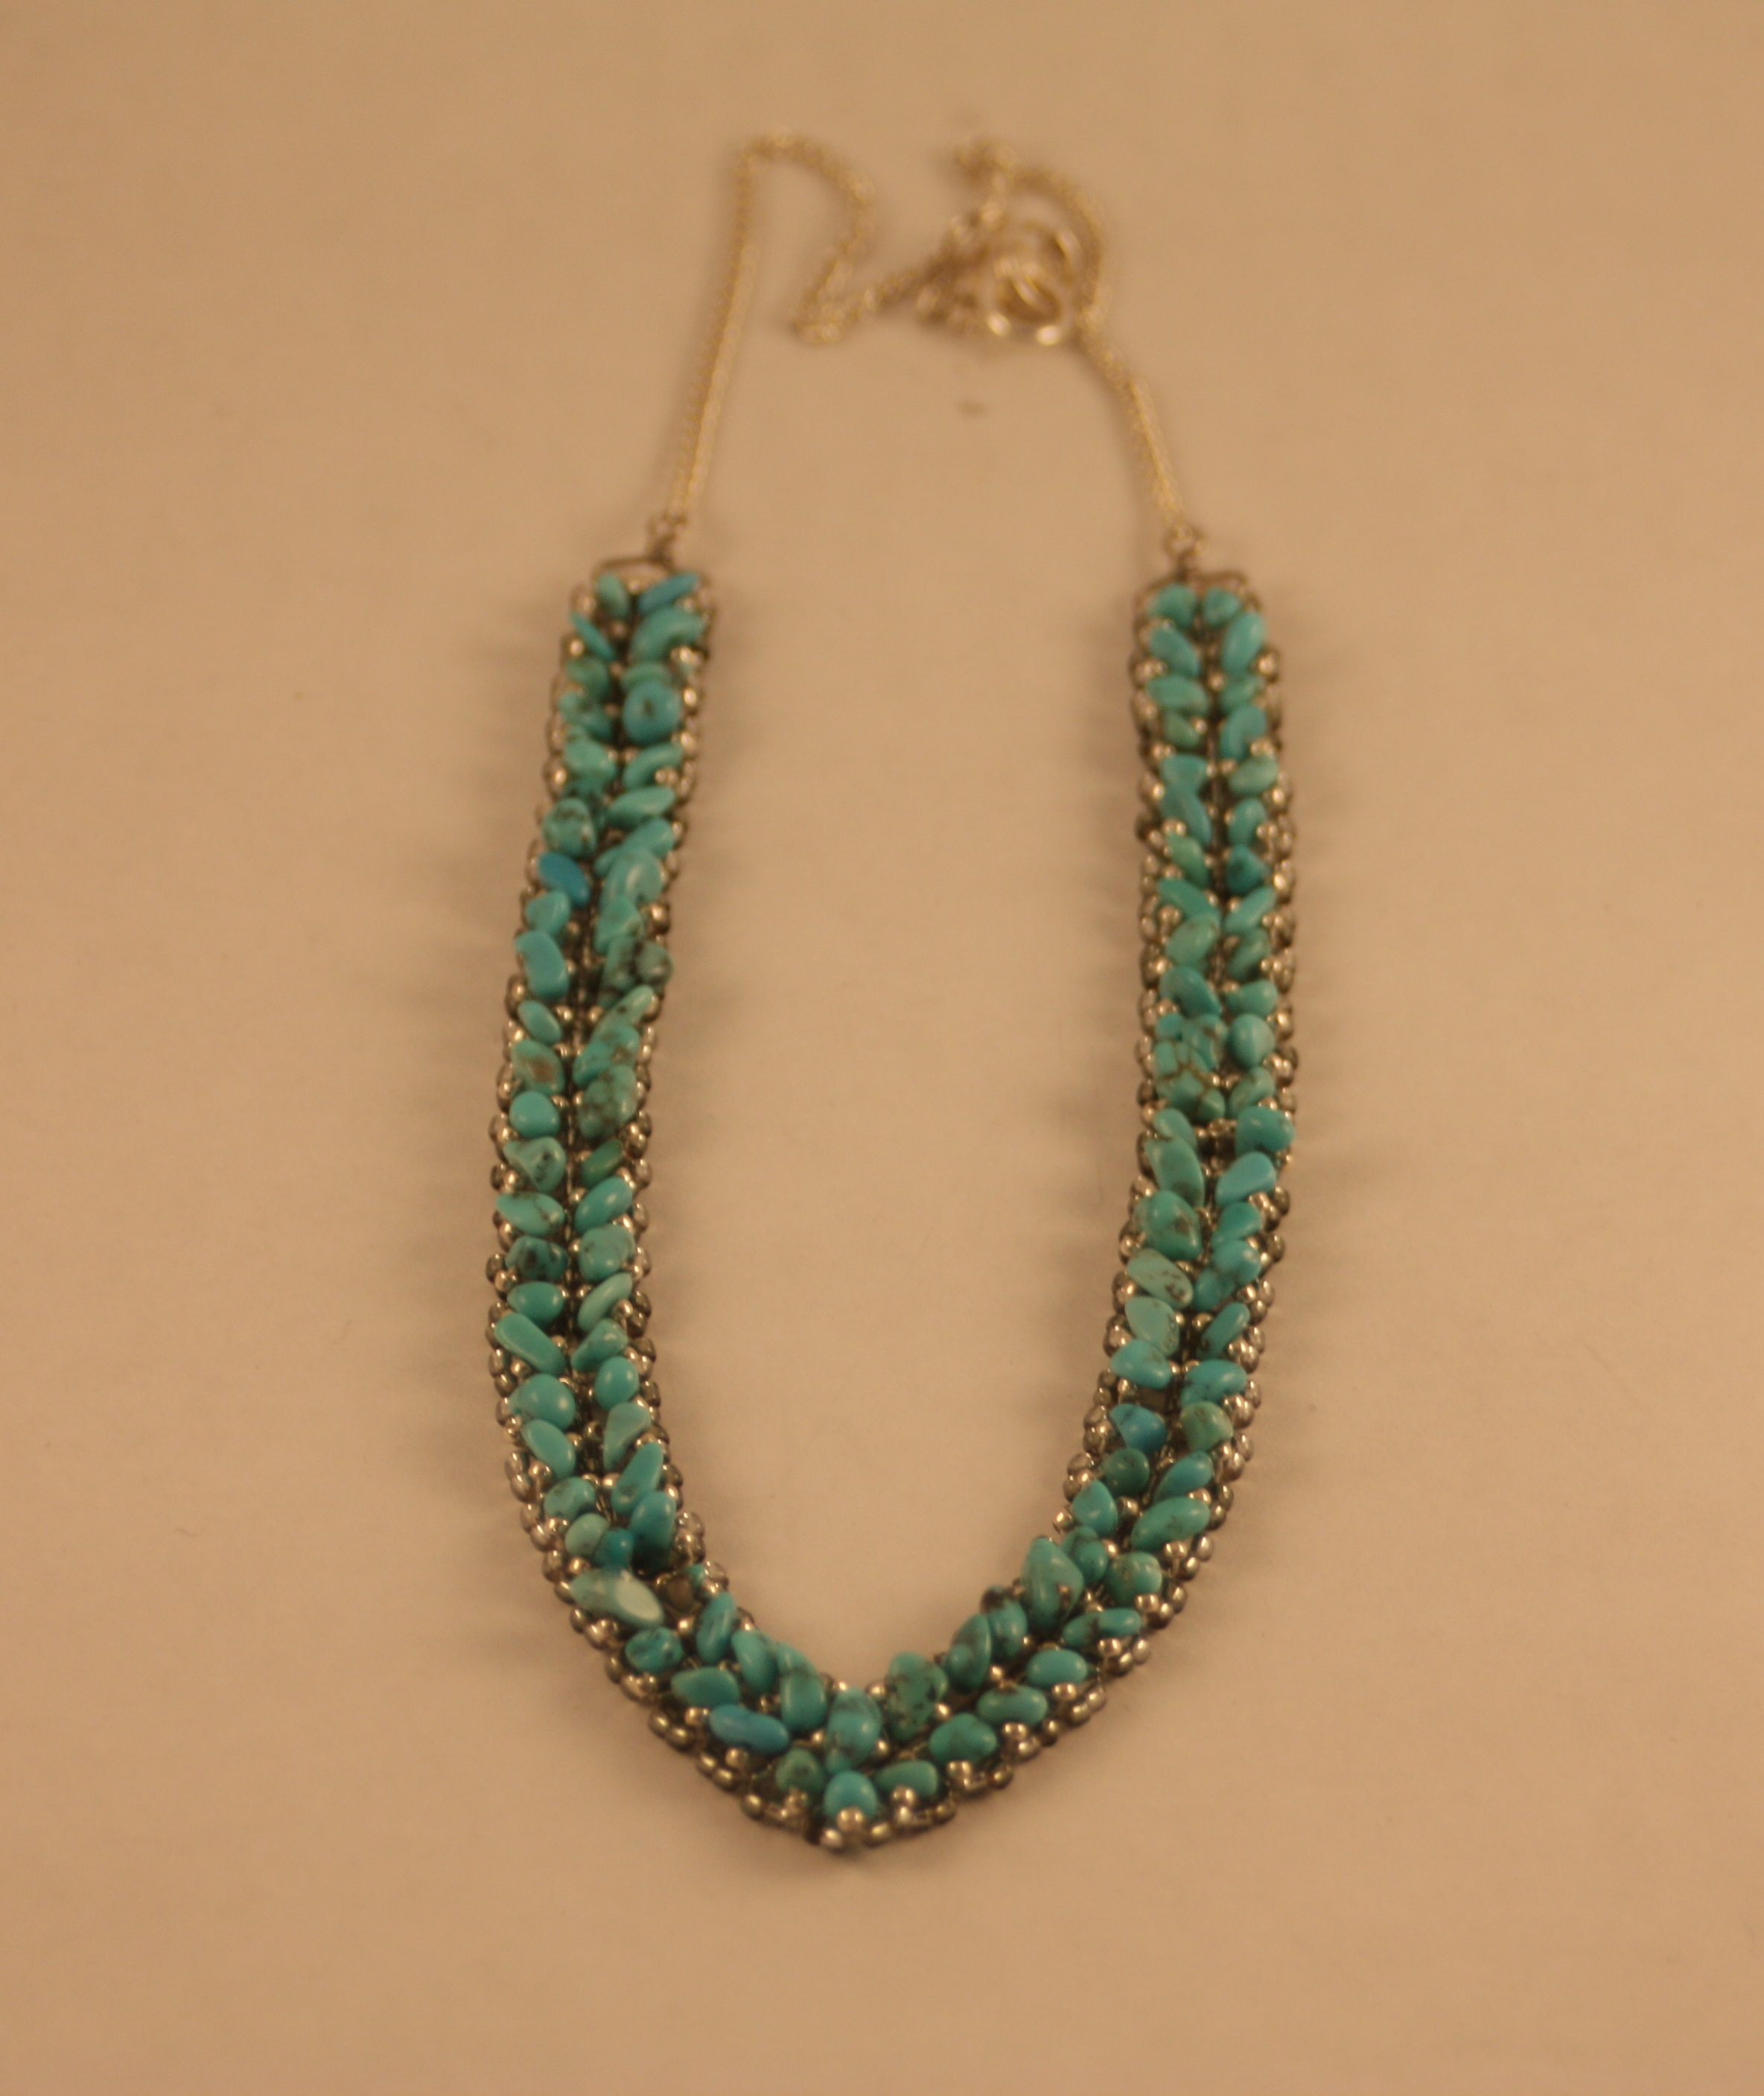 Beaded Diamond: Alonzo John Beaded Necklace Diamond Point Turqoise